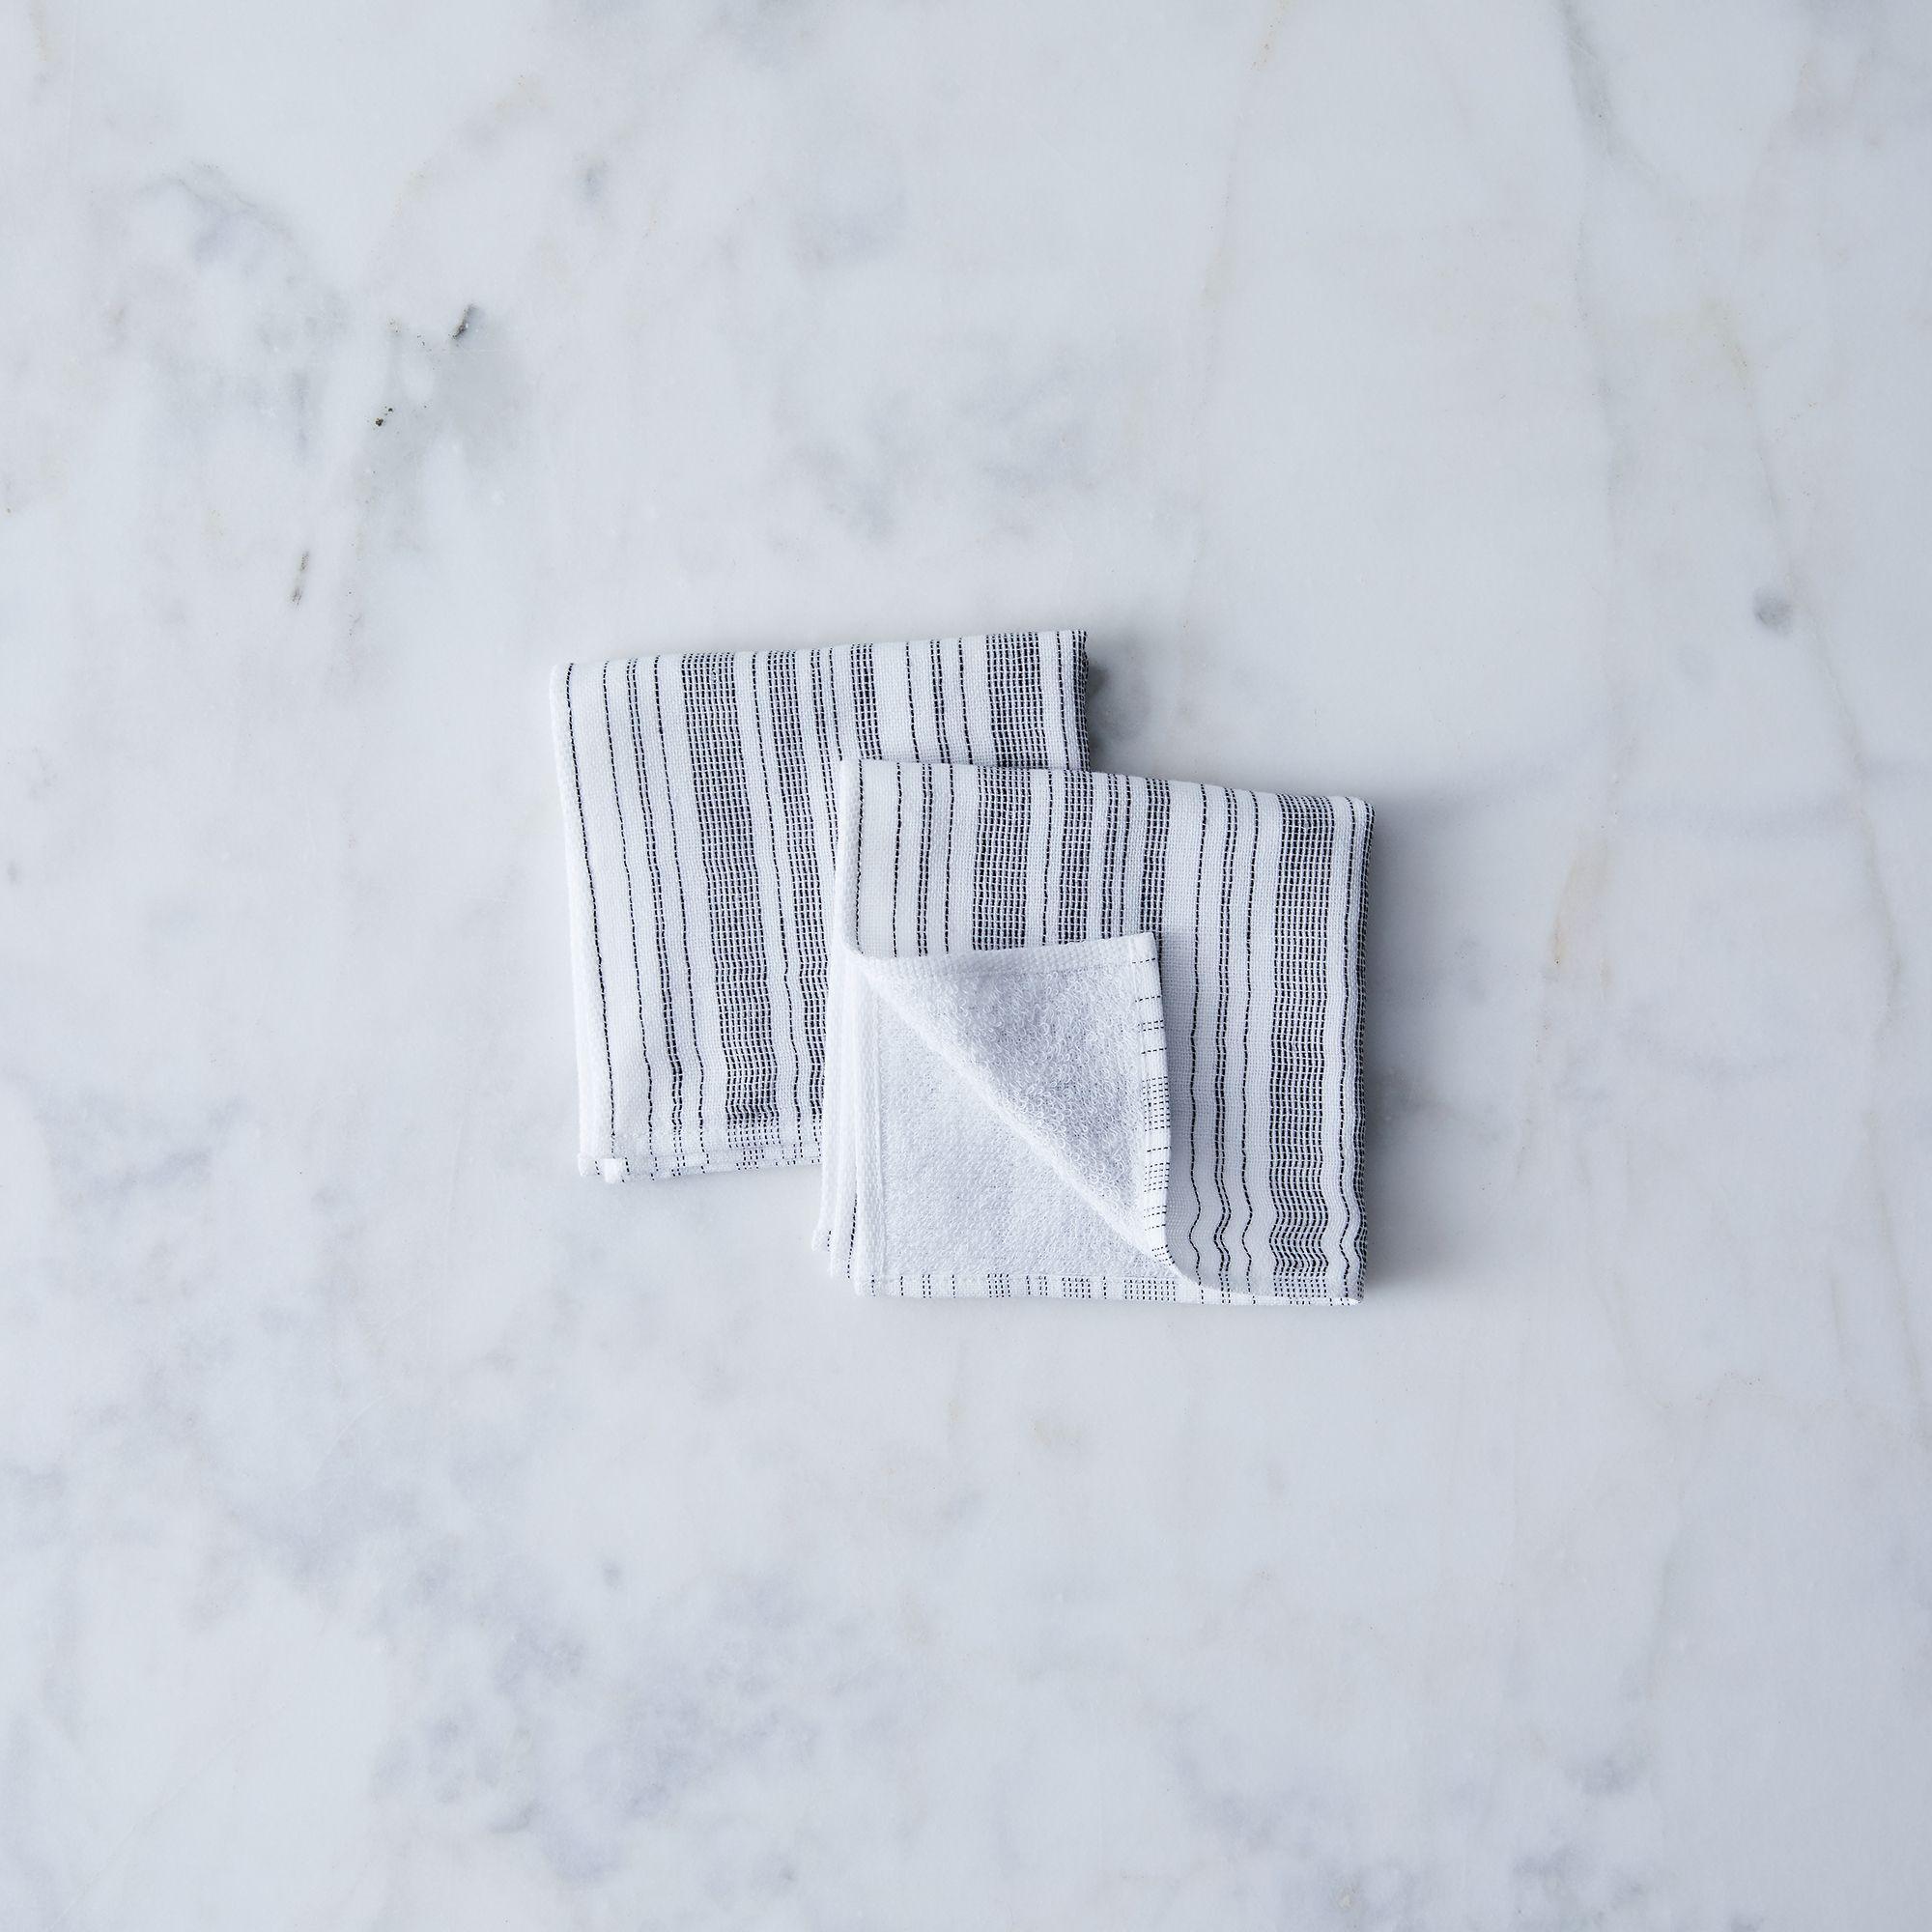 7e6abb9f b983 44b4 9942 d80aa11dfb63  2017 1218 morihata shirt stripe towels grey cbk washcloths set of 2 silo ty mecham 002